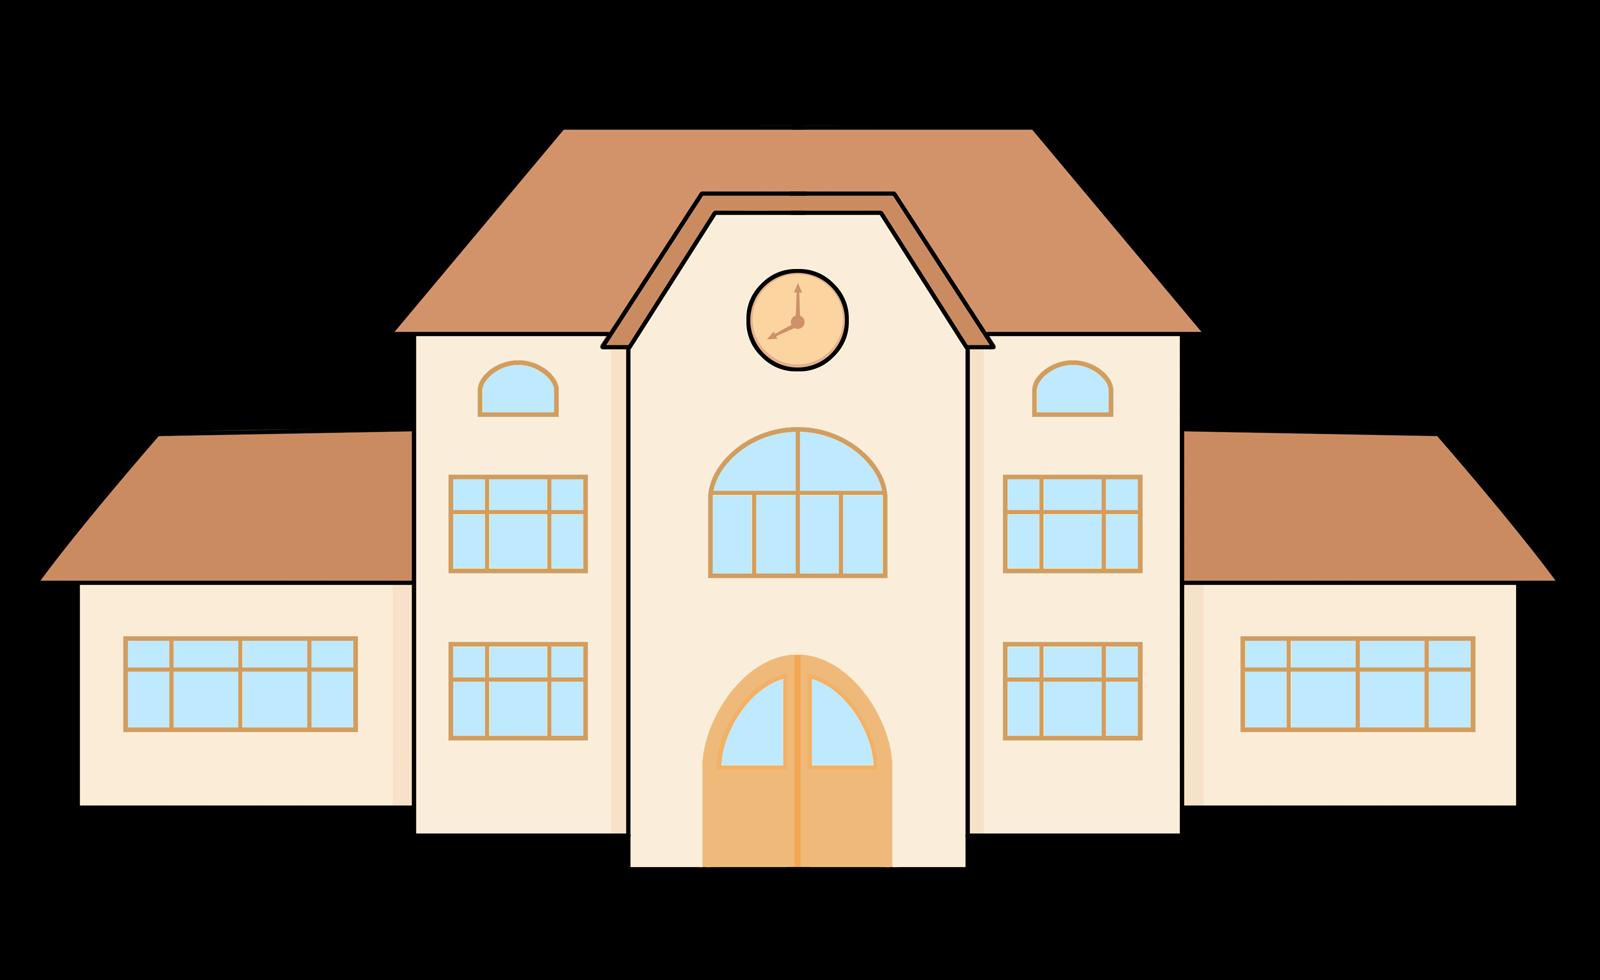 Free Building Clipart, Download Free Clip Art, Free Clip Art.